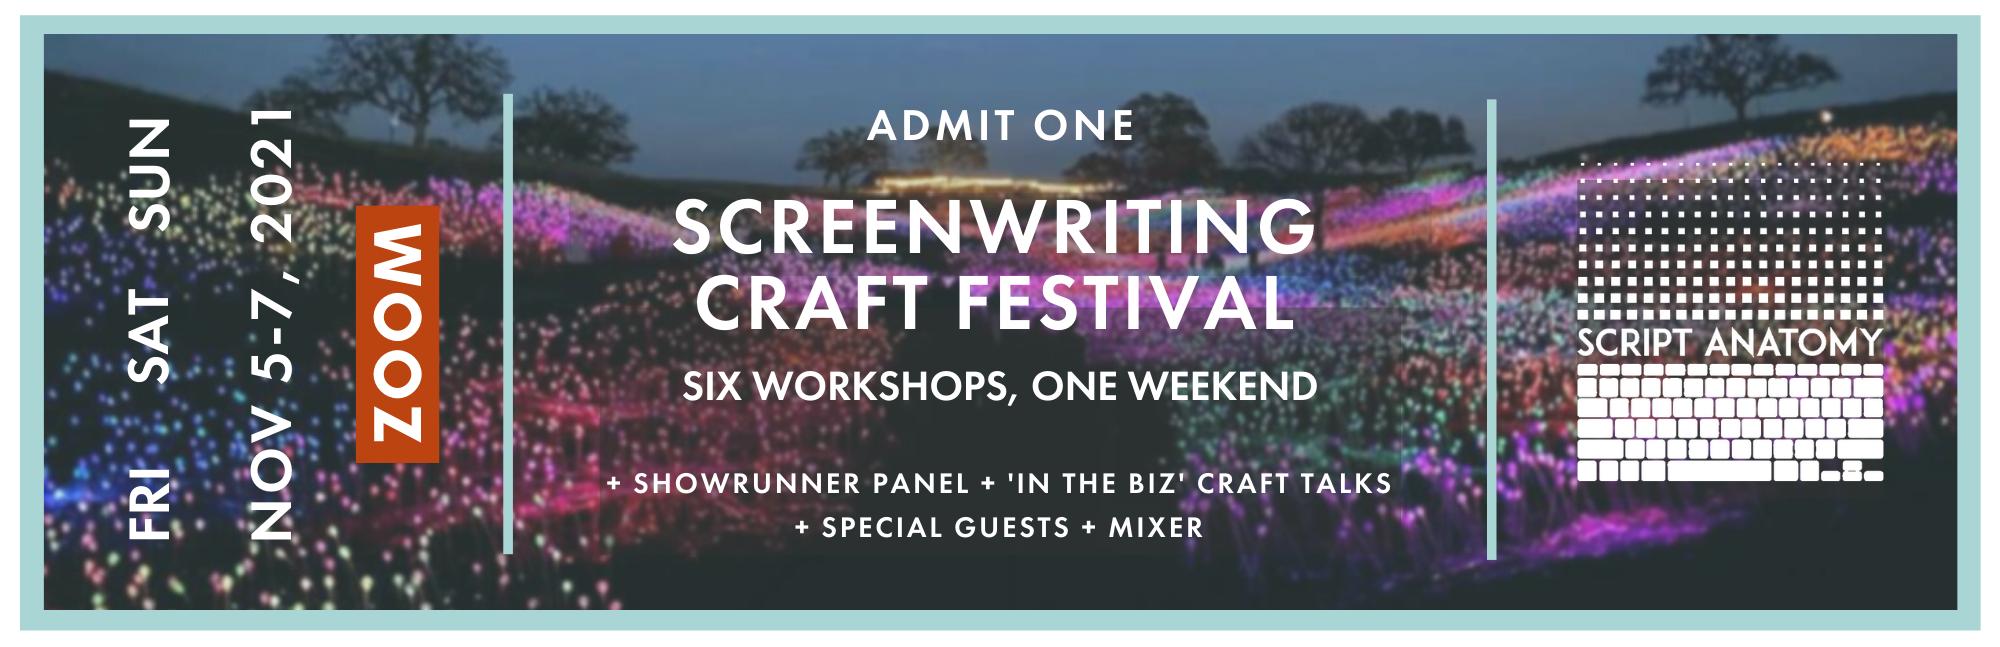 Screenwriting Craft Festival Pass